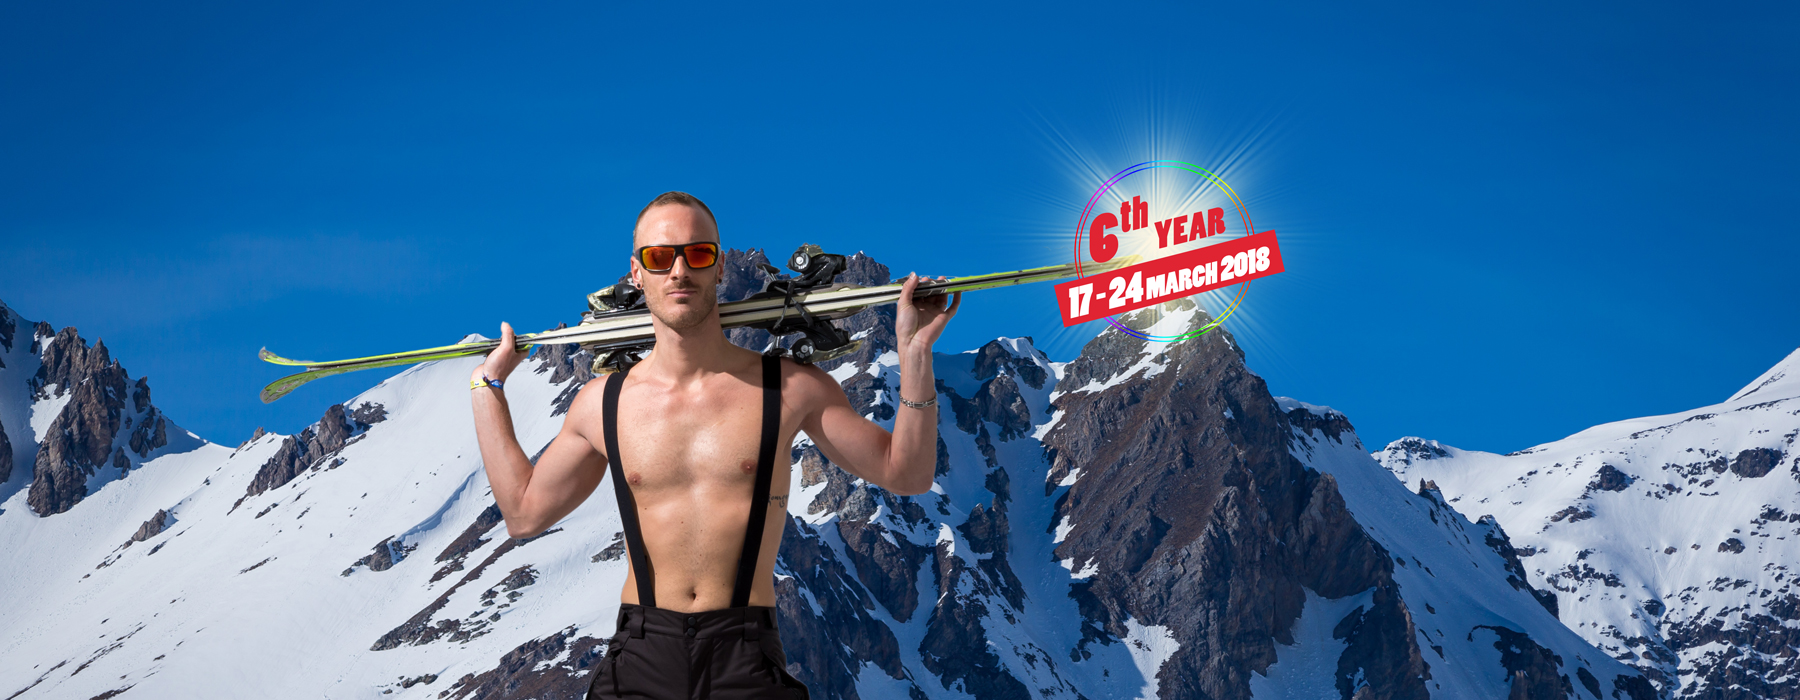 from Jose gay ski week tignes